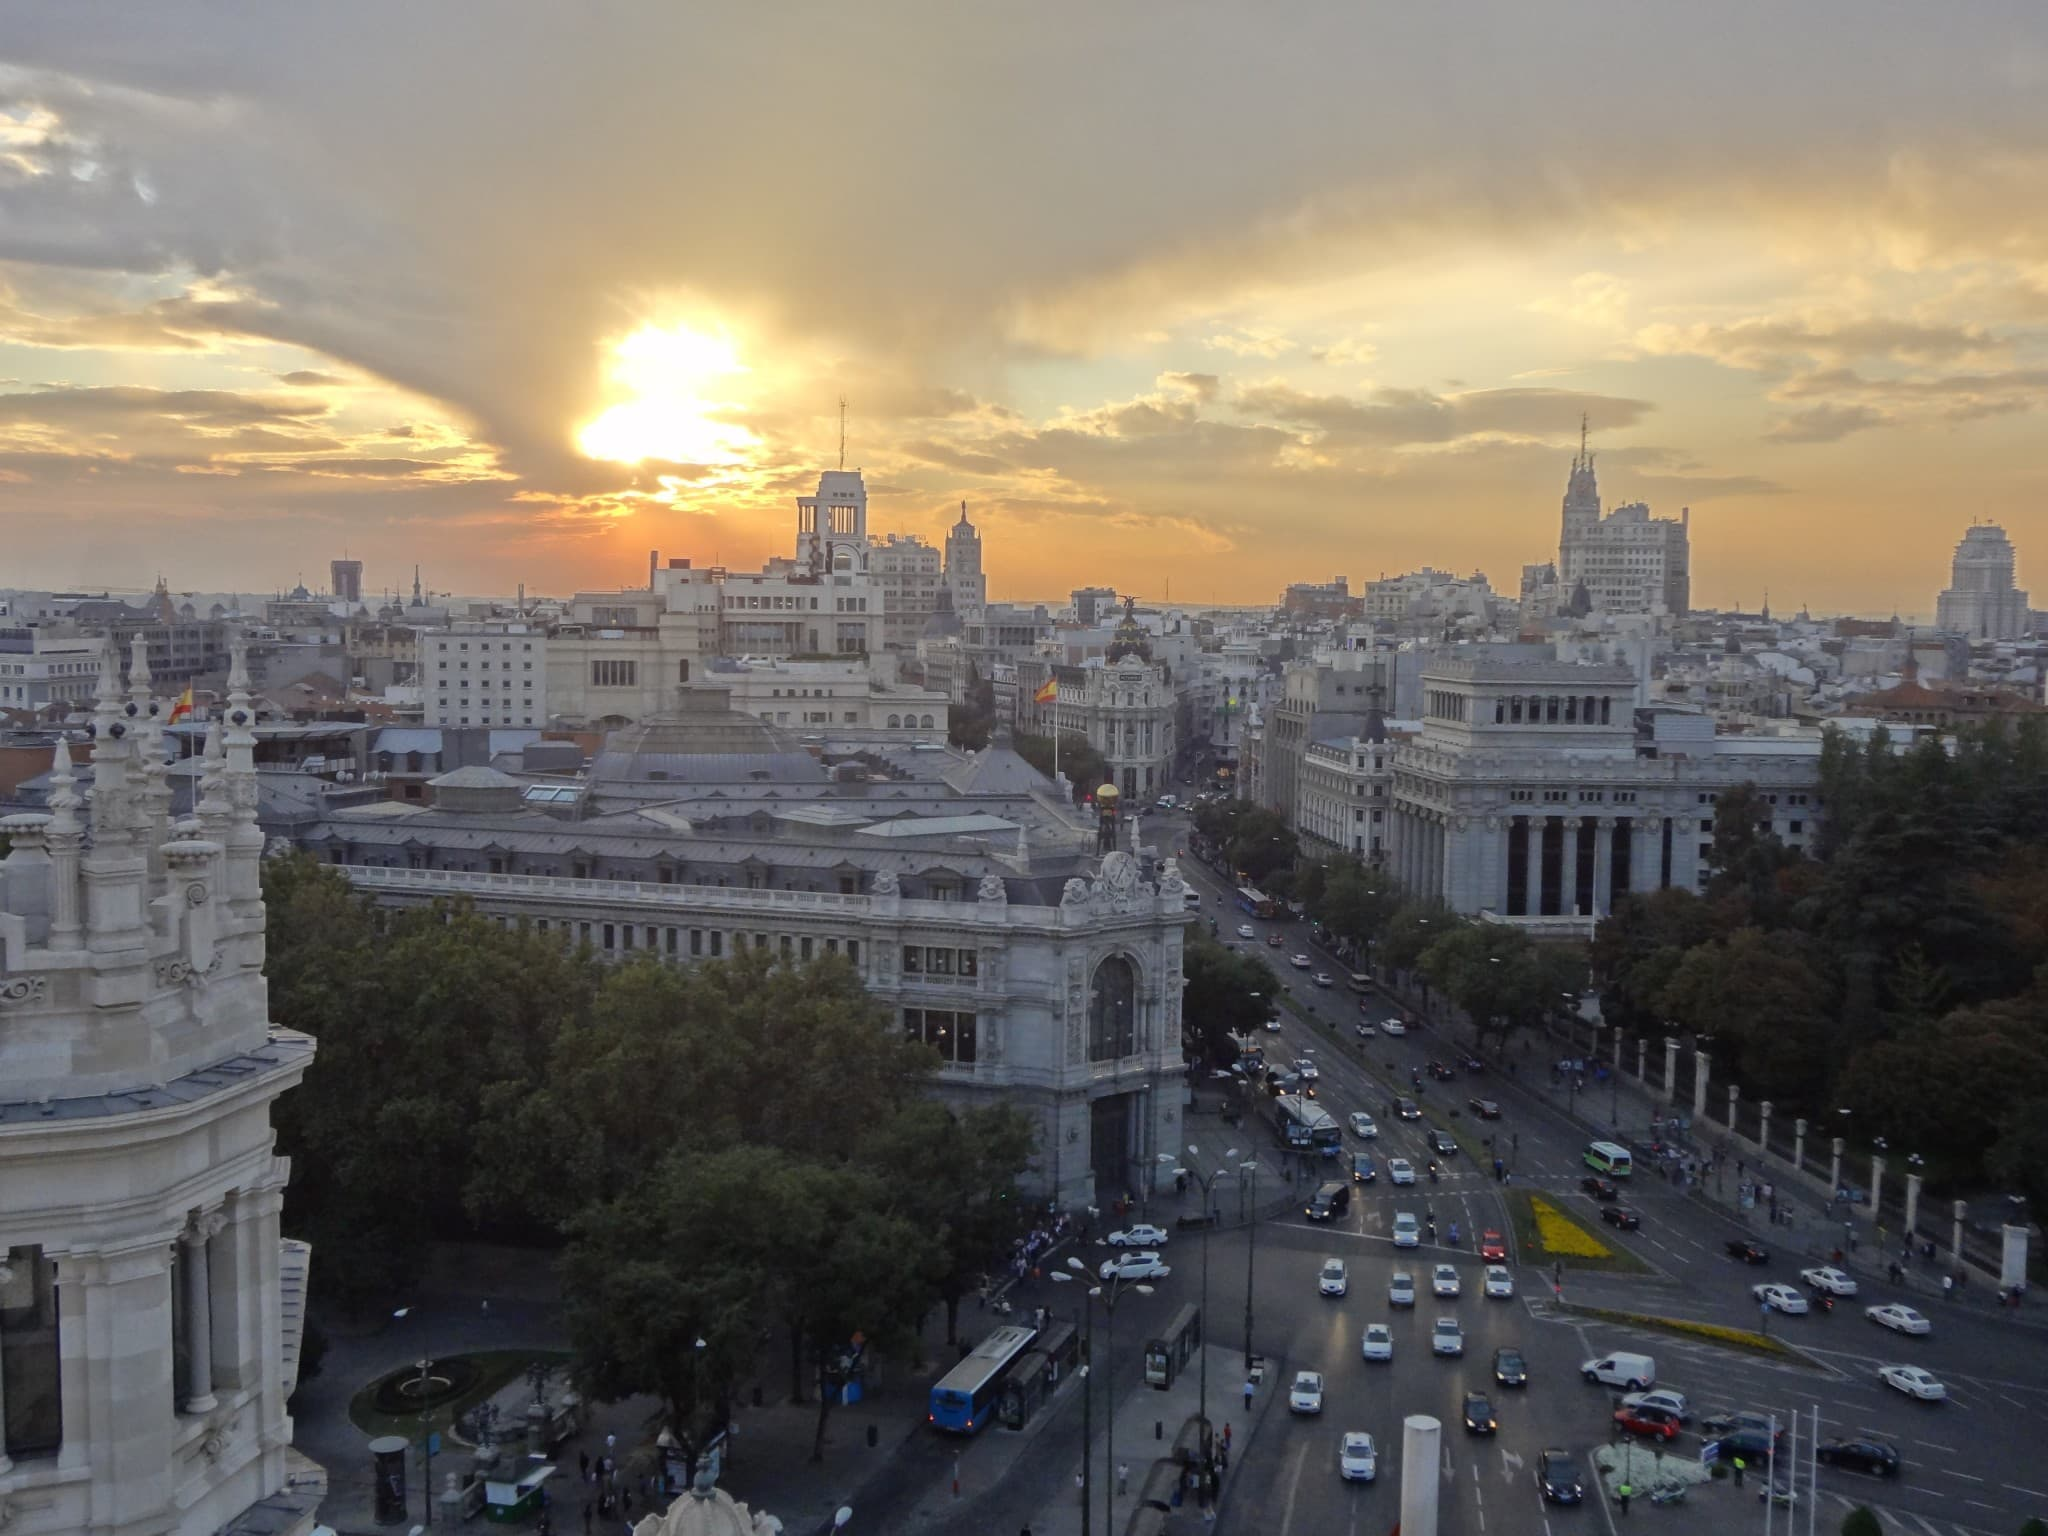 Spain - Madrid - Square Cibeles